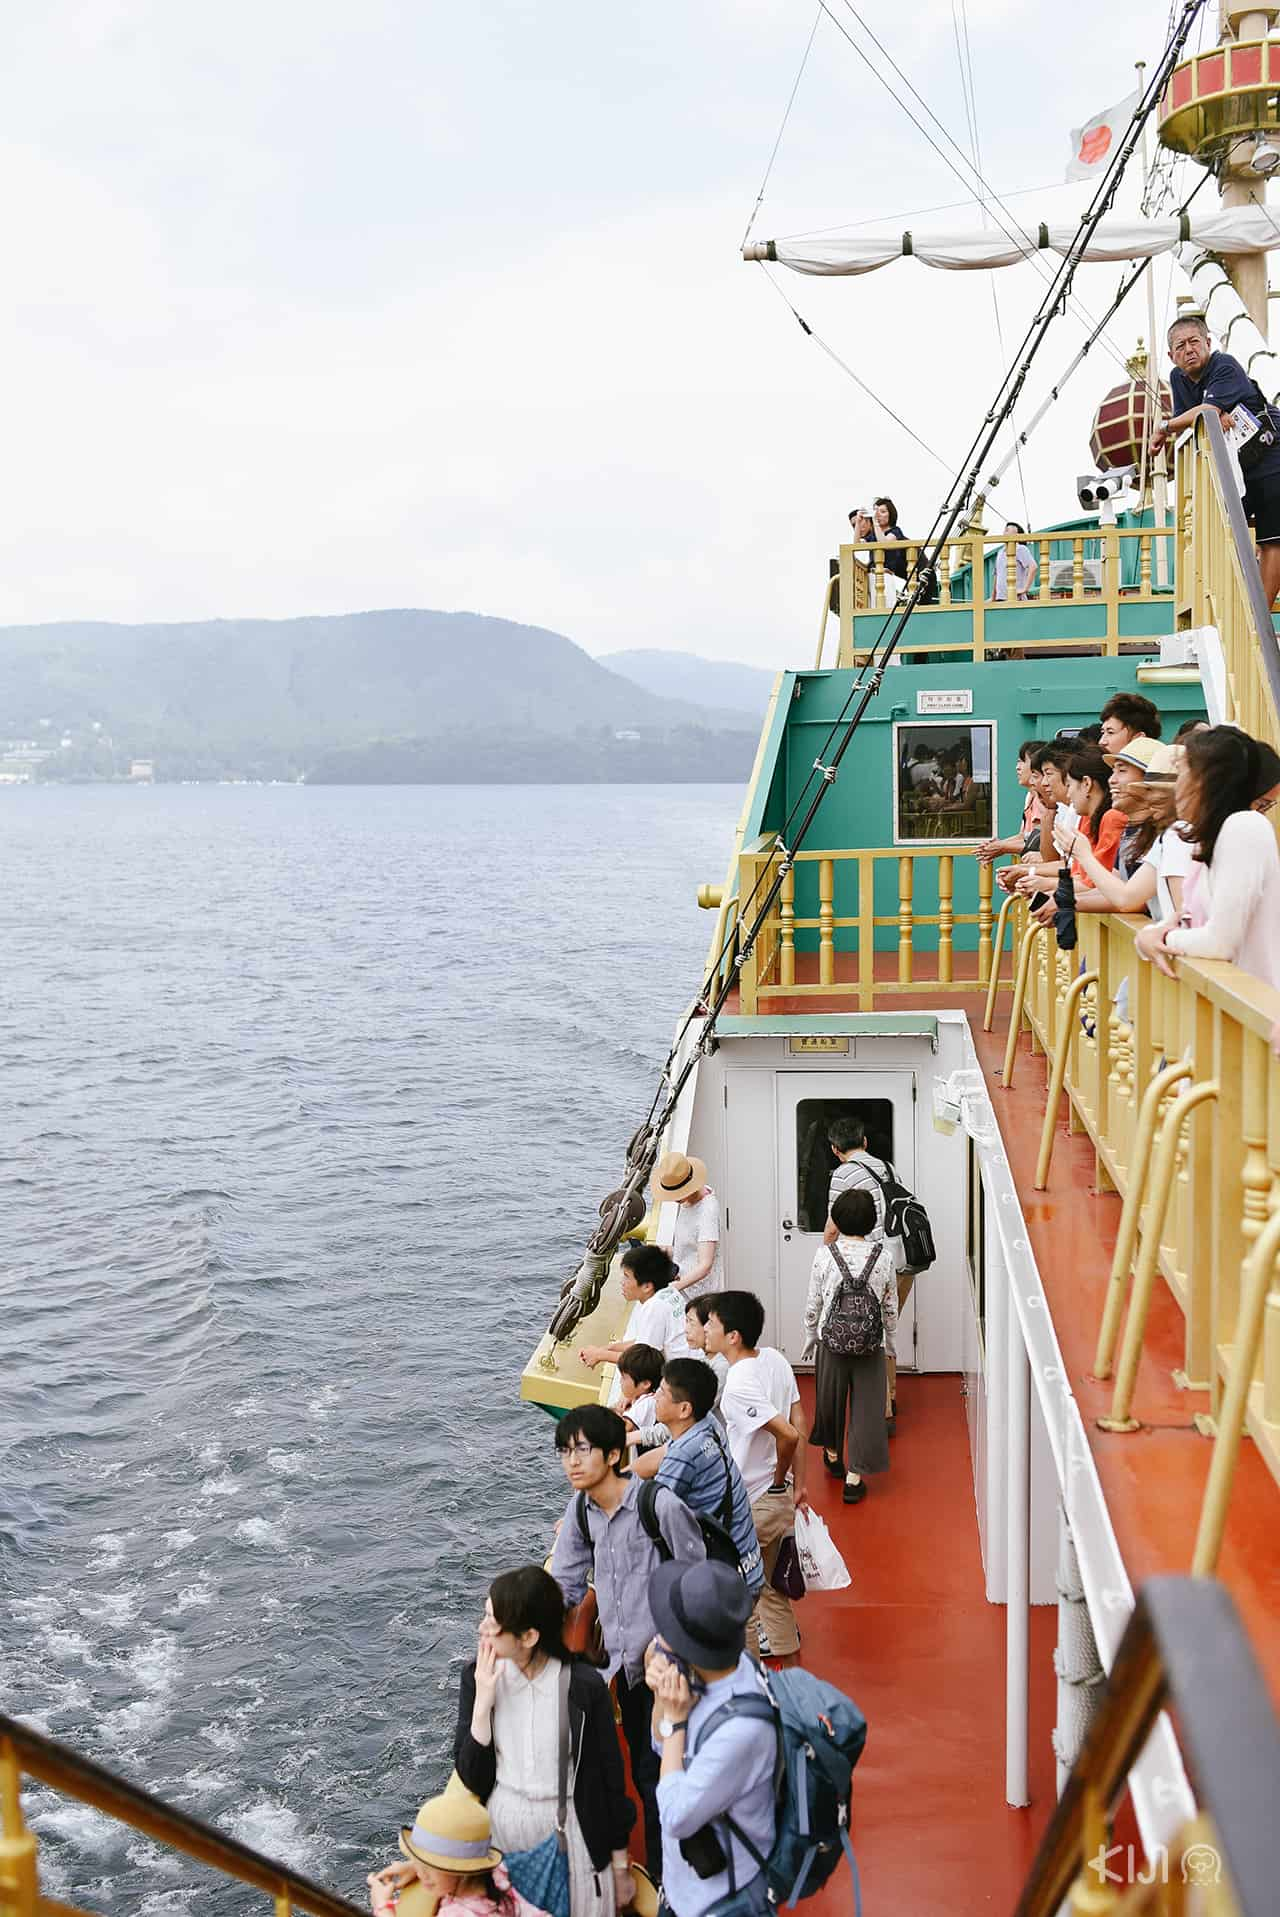 Hakone Sightseeing Cruise เรือนำเที่ยวชมรอบทะเลสาบอาชิ (Lake Ashi)